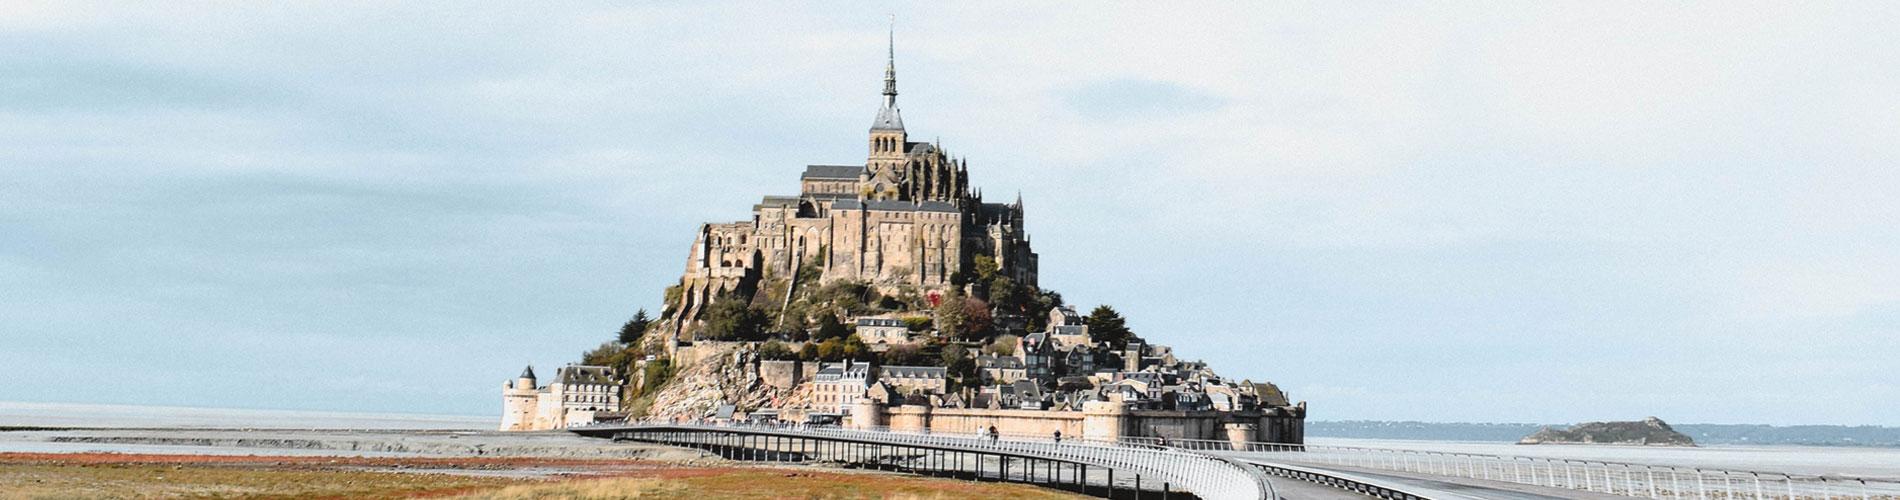 Blog_EarlyBooking_EC_Mont-Saint-Michel_1900x500_Q120